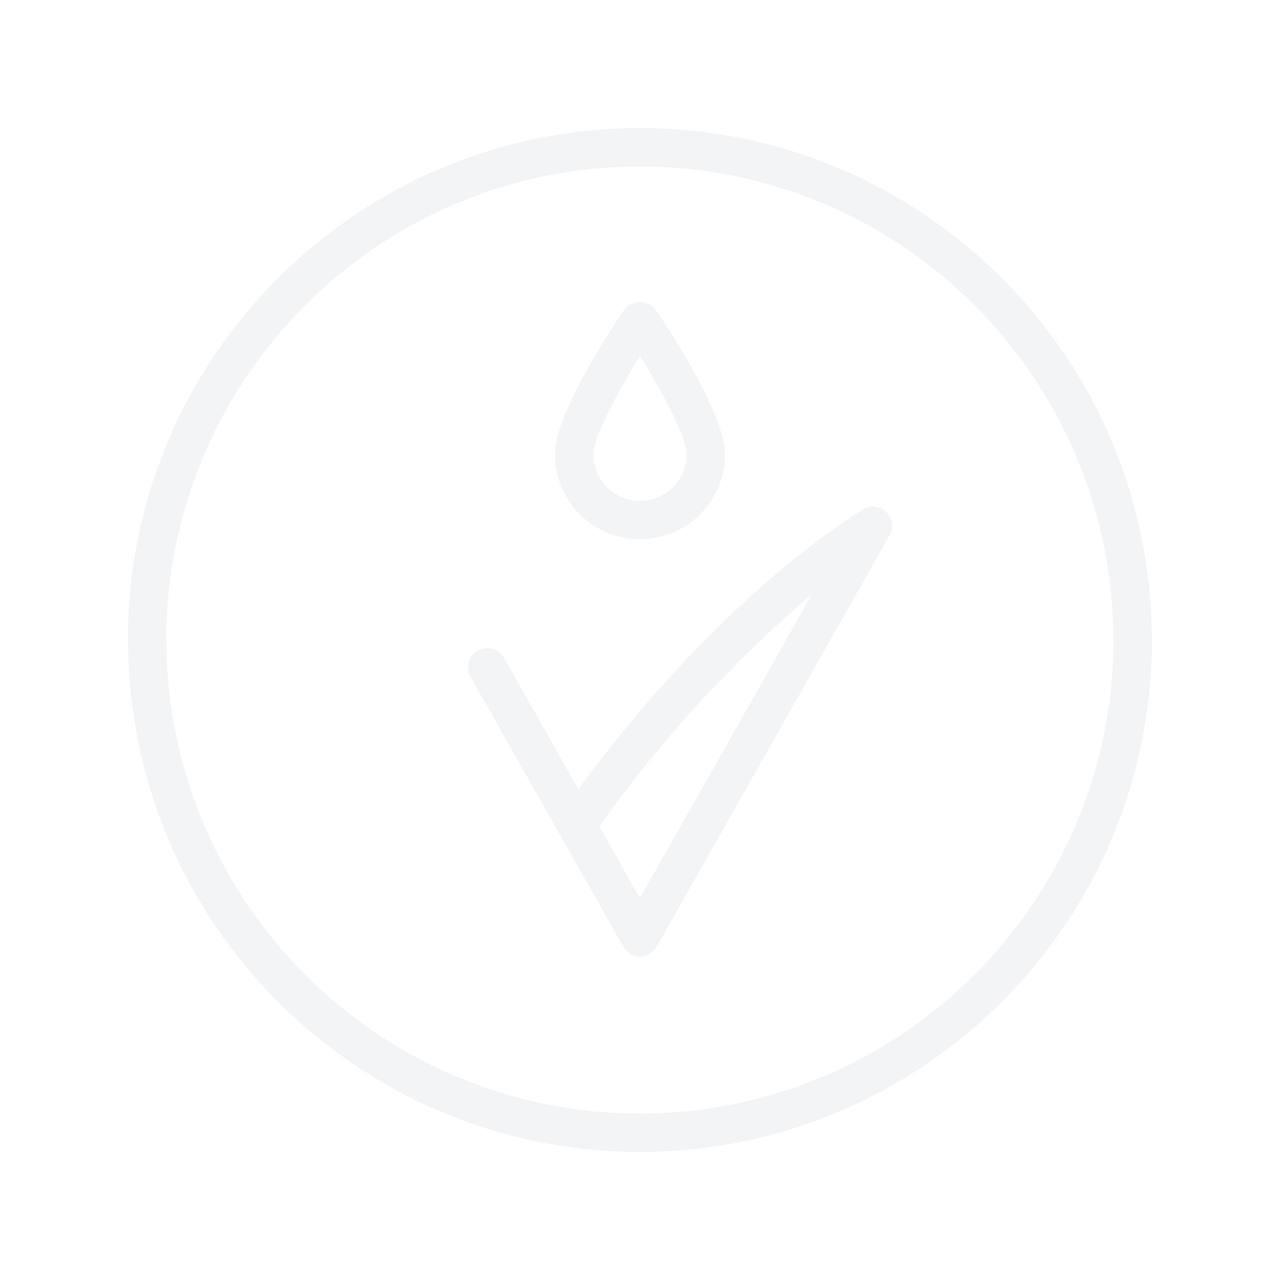 GIORGIO ARMANI Code for Men 75ml Eau De Toilette Travel Gift Set